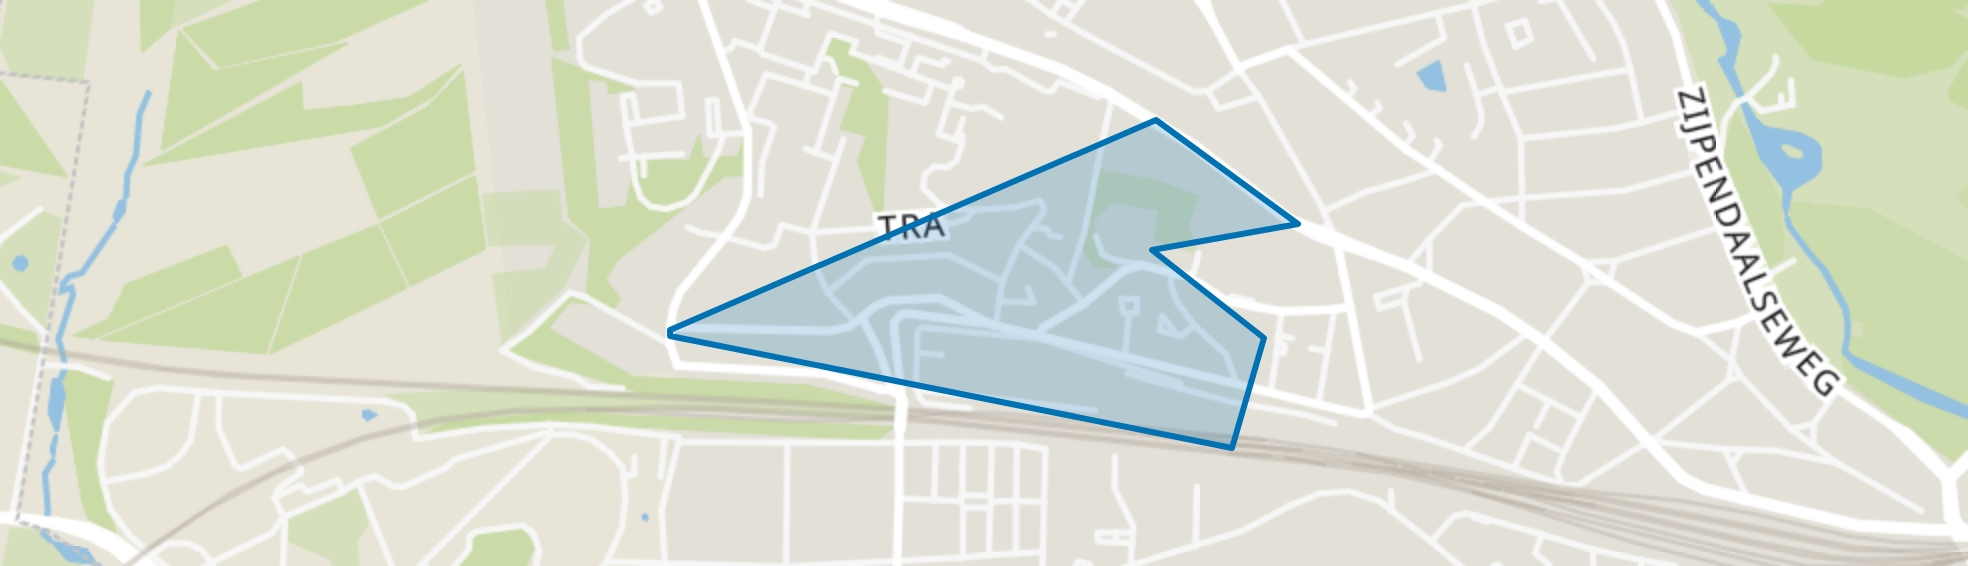 Heijenoord, Arnhem map